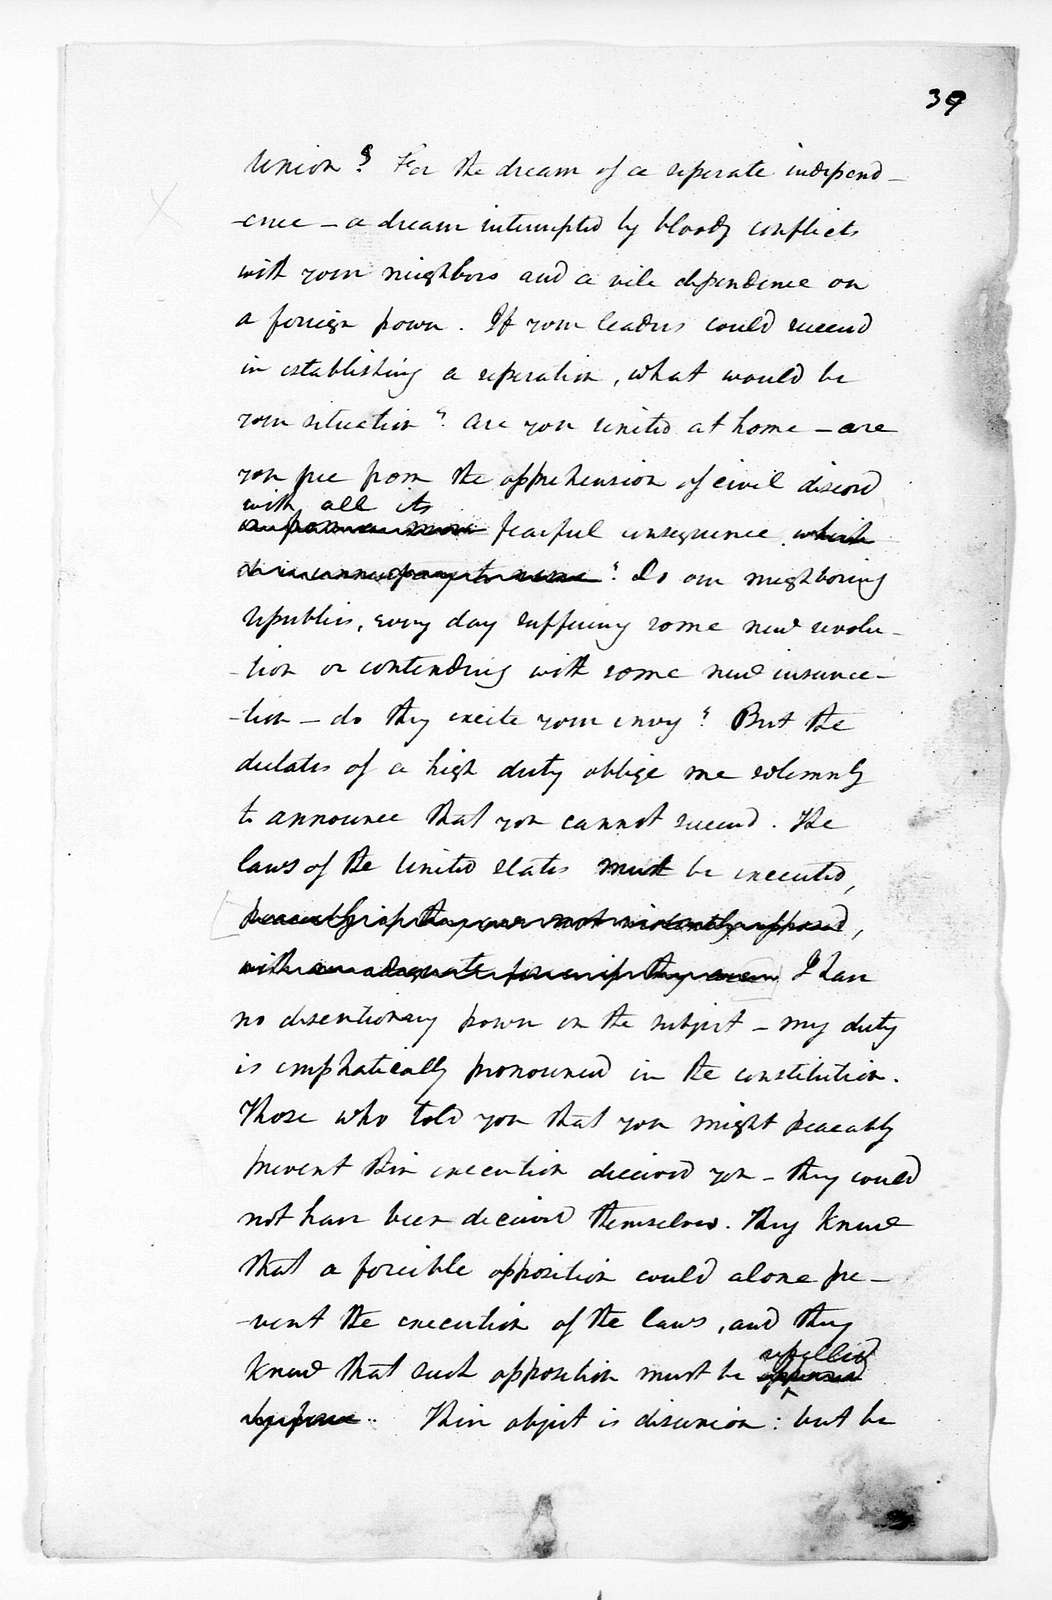 Andrew Jackson, December 4, 1832